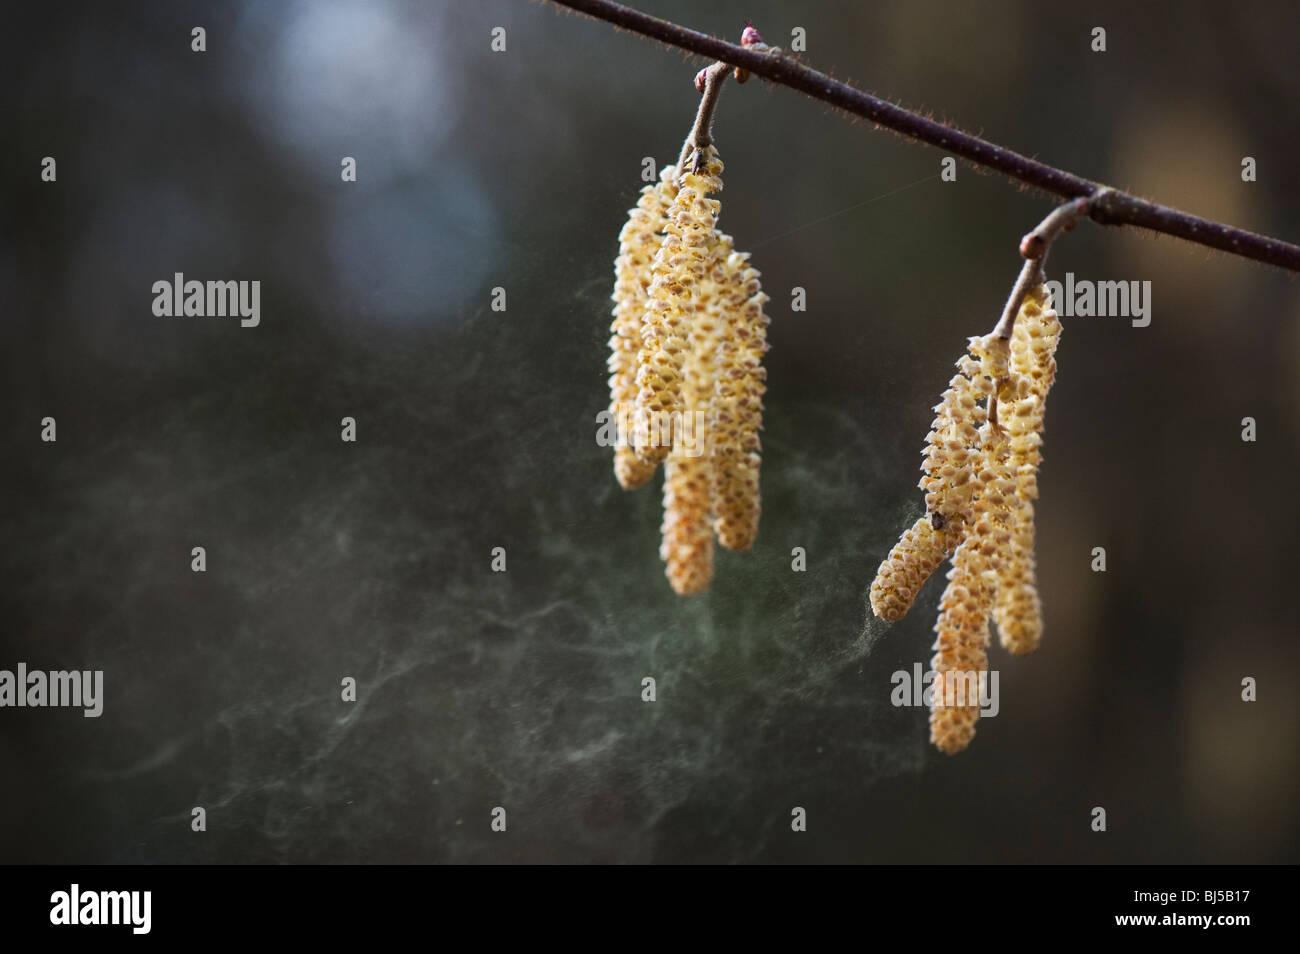 Corylus avellana. Common Hazel catkins releasing pollen in spring. UK Stock Photo